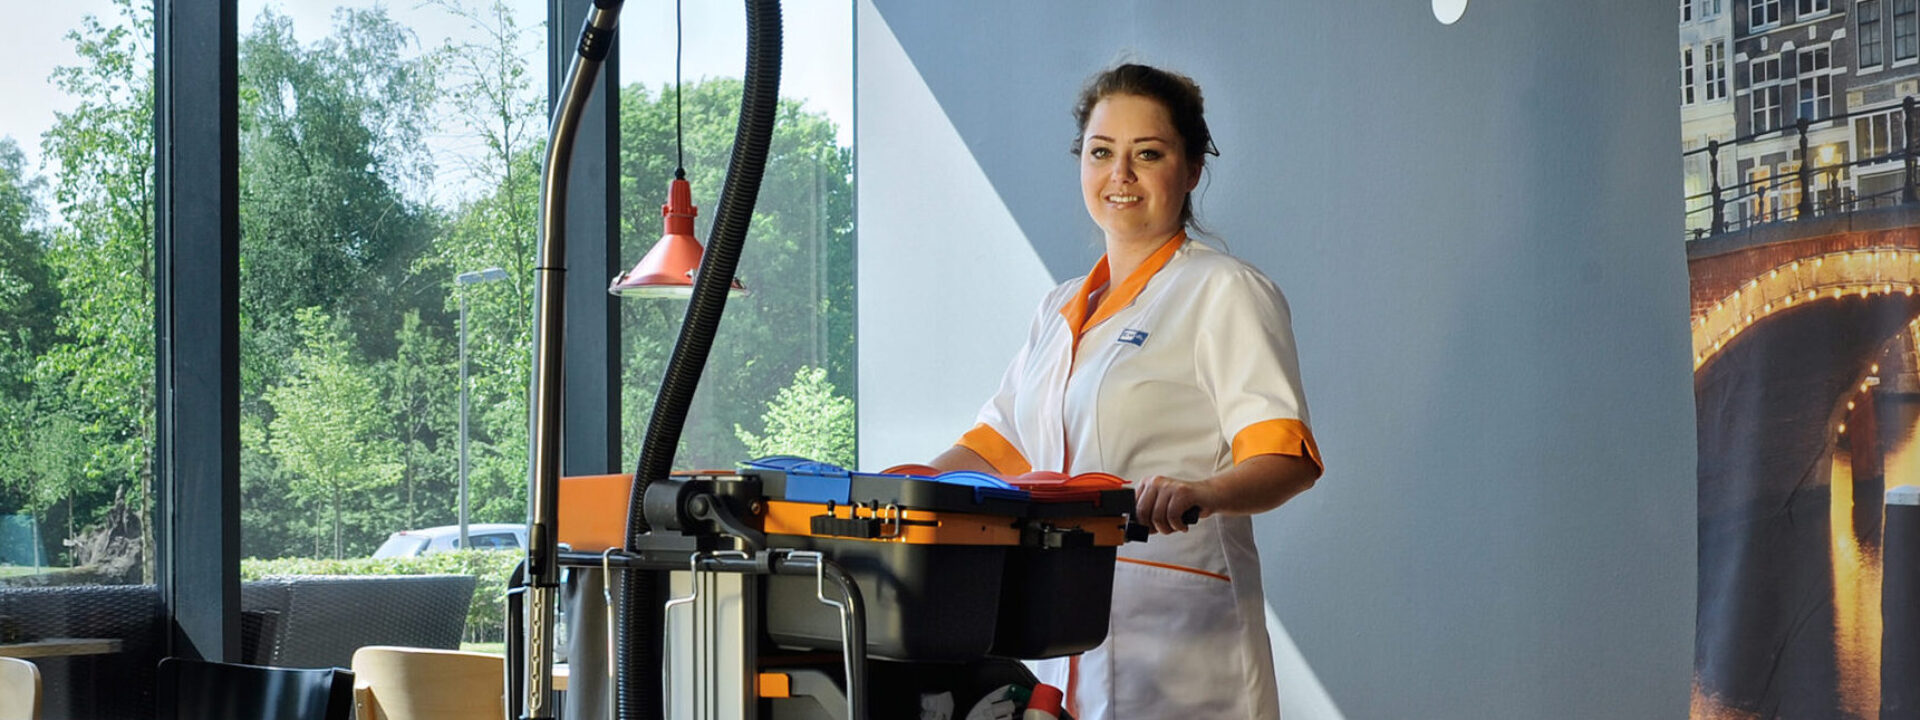 Buurtzorgpension en EW Facility Services breiden samenwerking uit